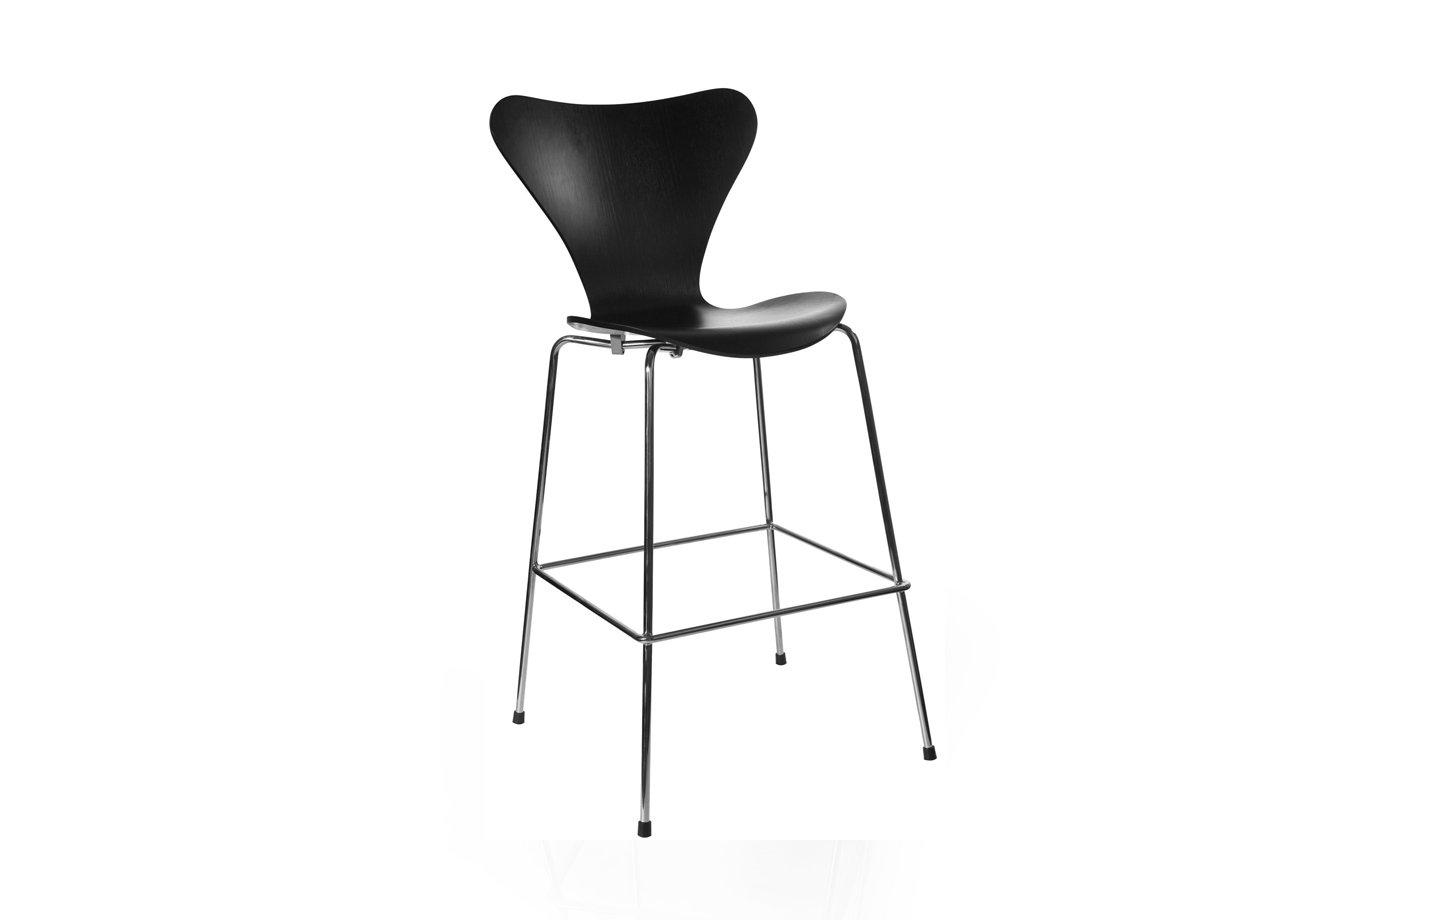 stool chair dubai replacement garden covers series 7 barstool fabiia uae